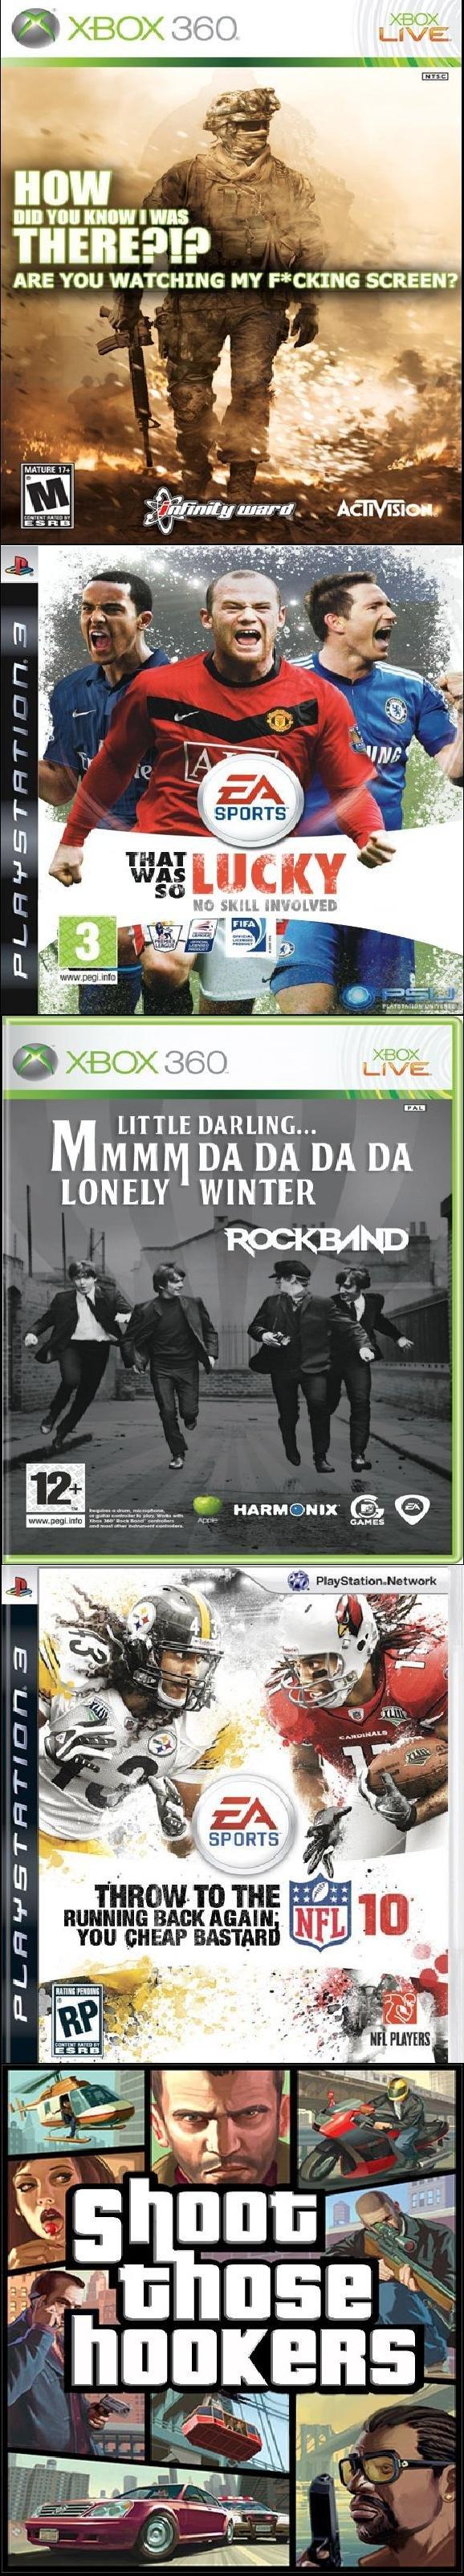 Game Titles In Real Life. creds to college humore. Ill; E ll tljp warn Adel h/ l LITTLE DARLING... DA DA DA DA LONELY WINTER You sump ? 5 pr game titles real